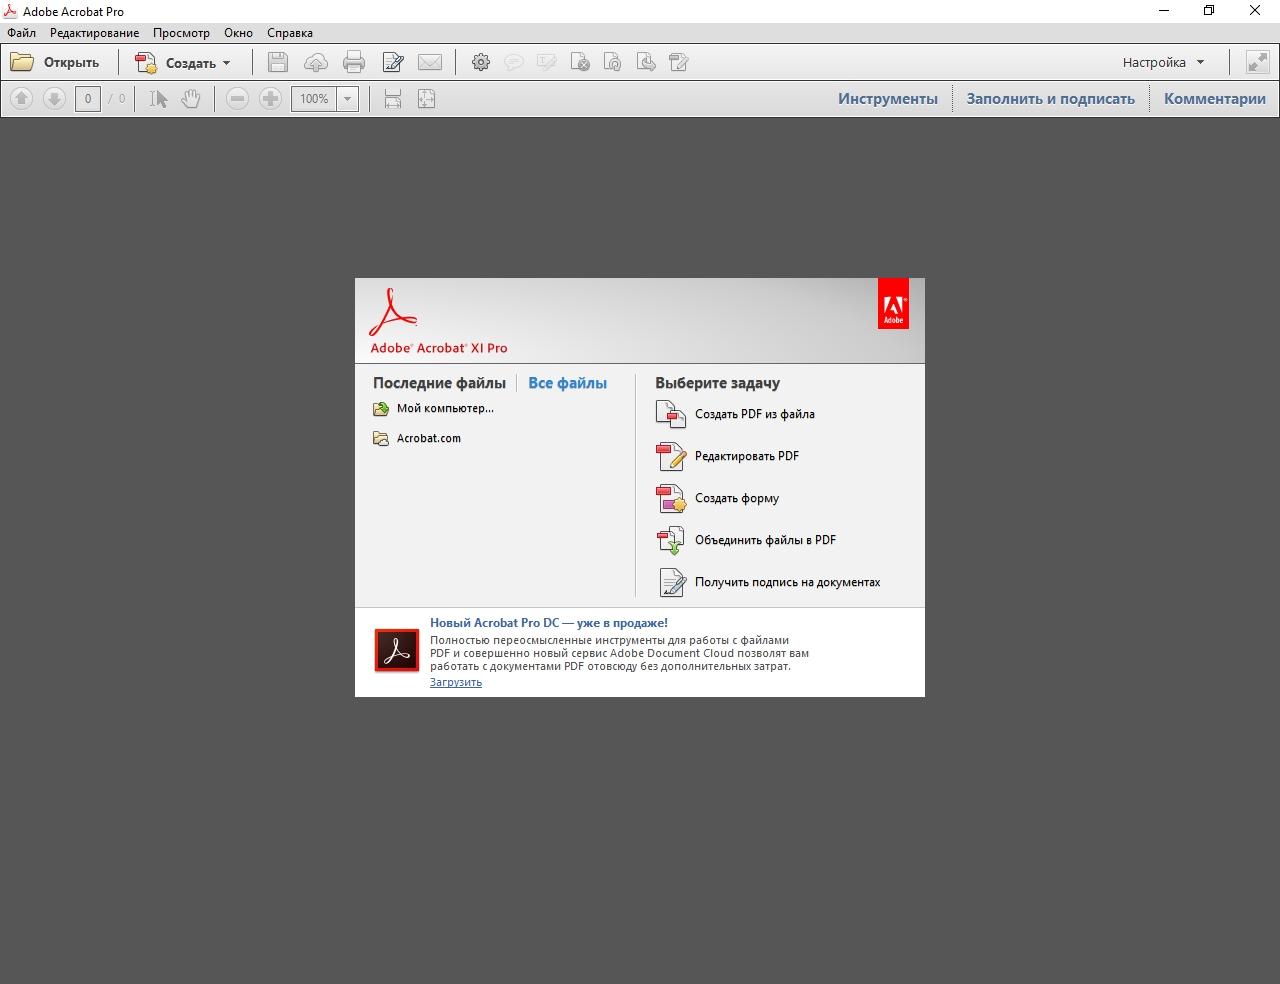 FULL Adobe Acrobat XI Pro 11.0.22 FINAL Crack